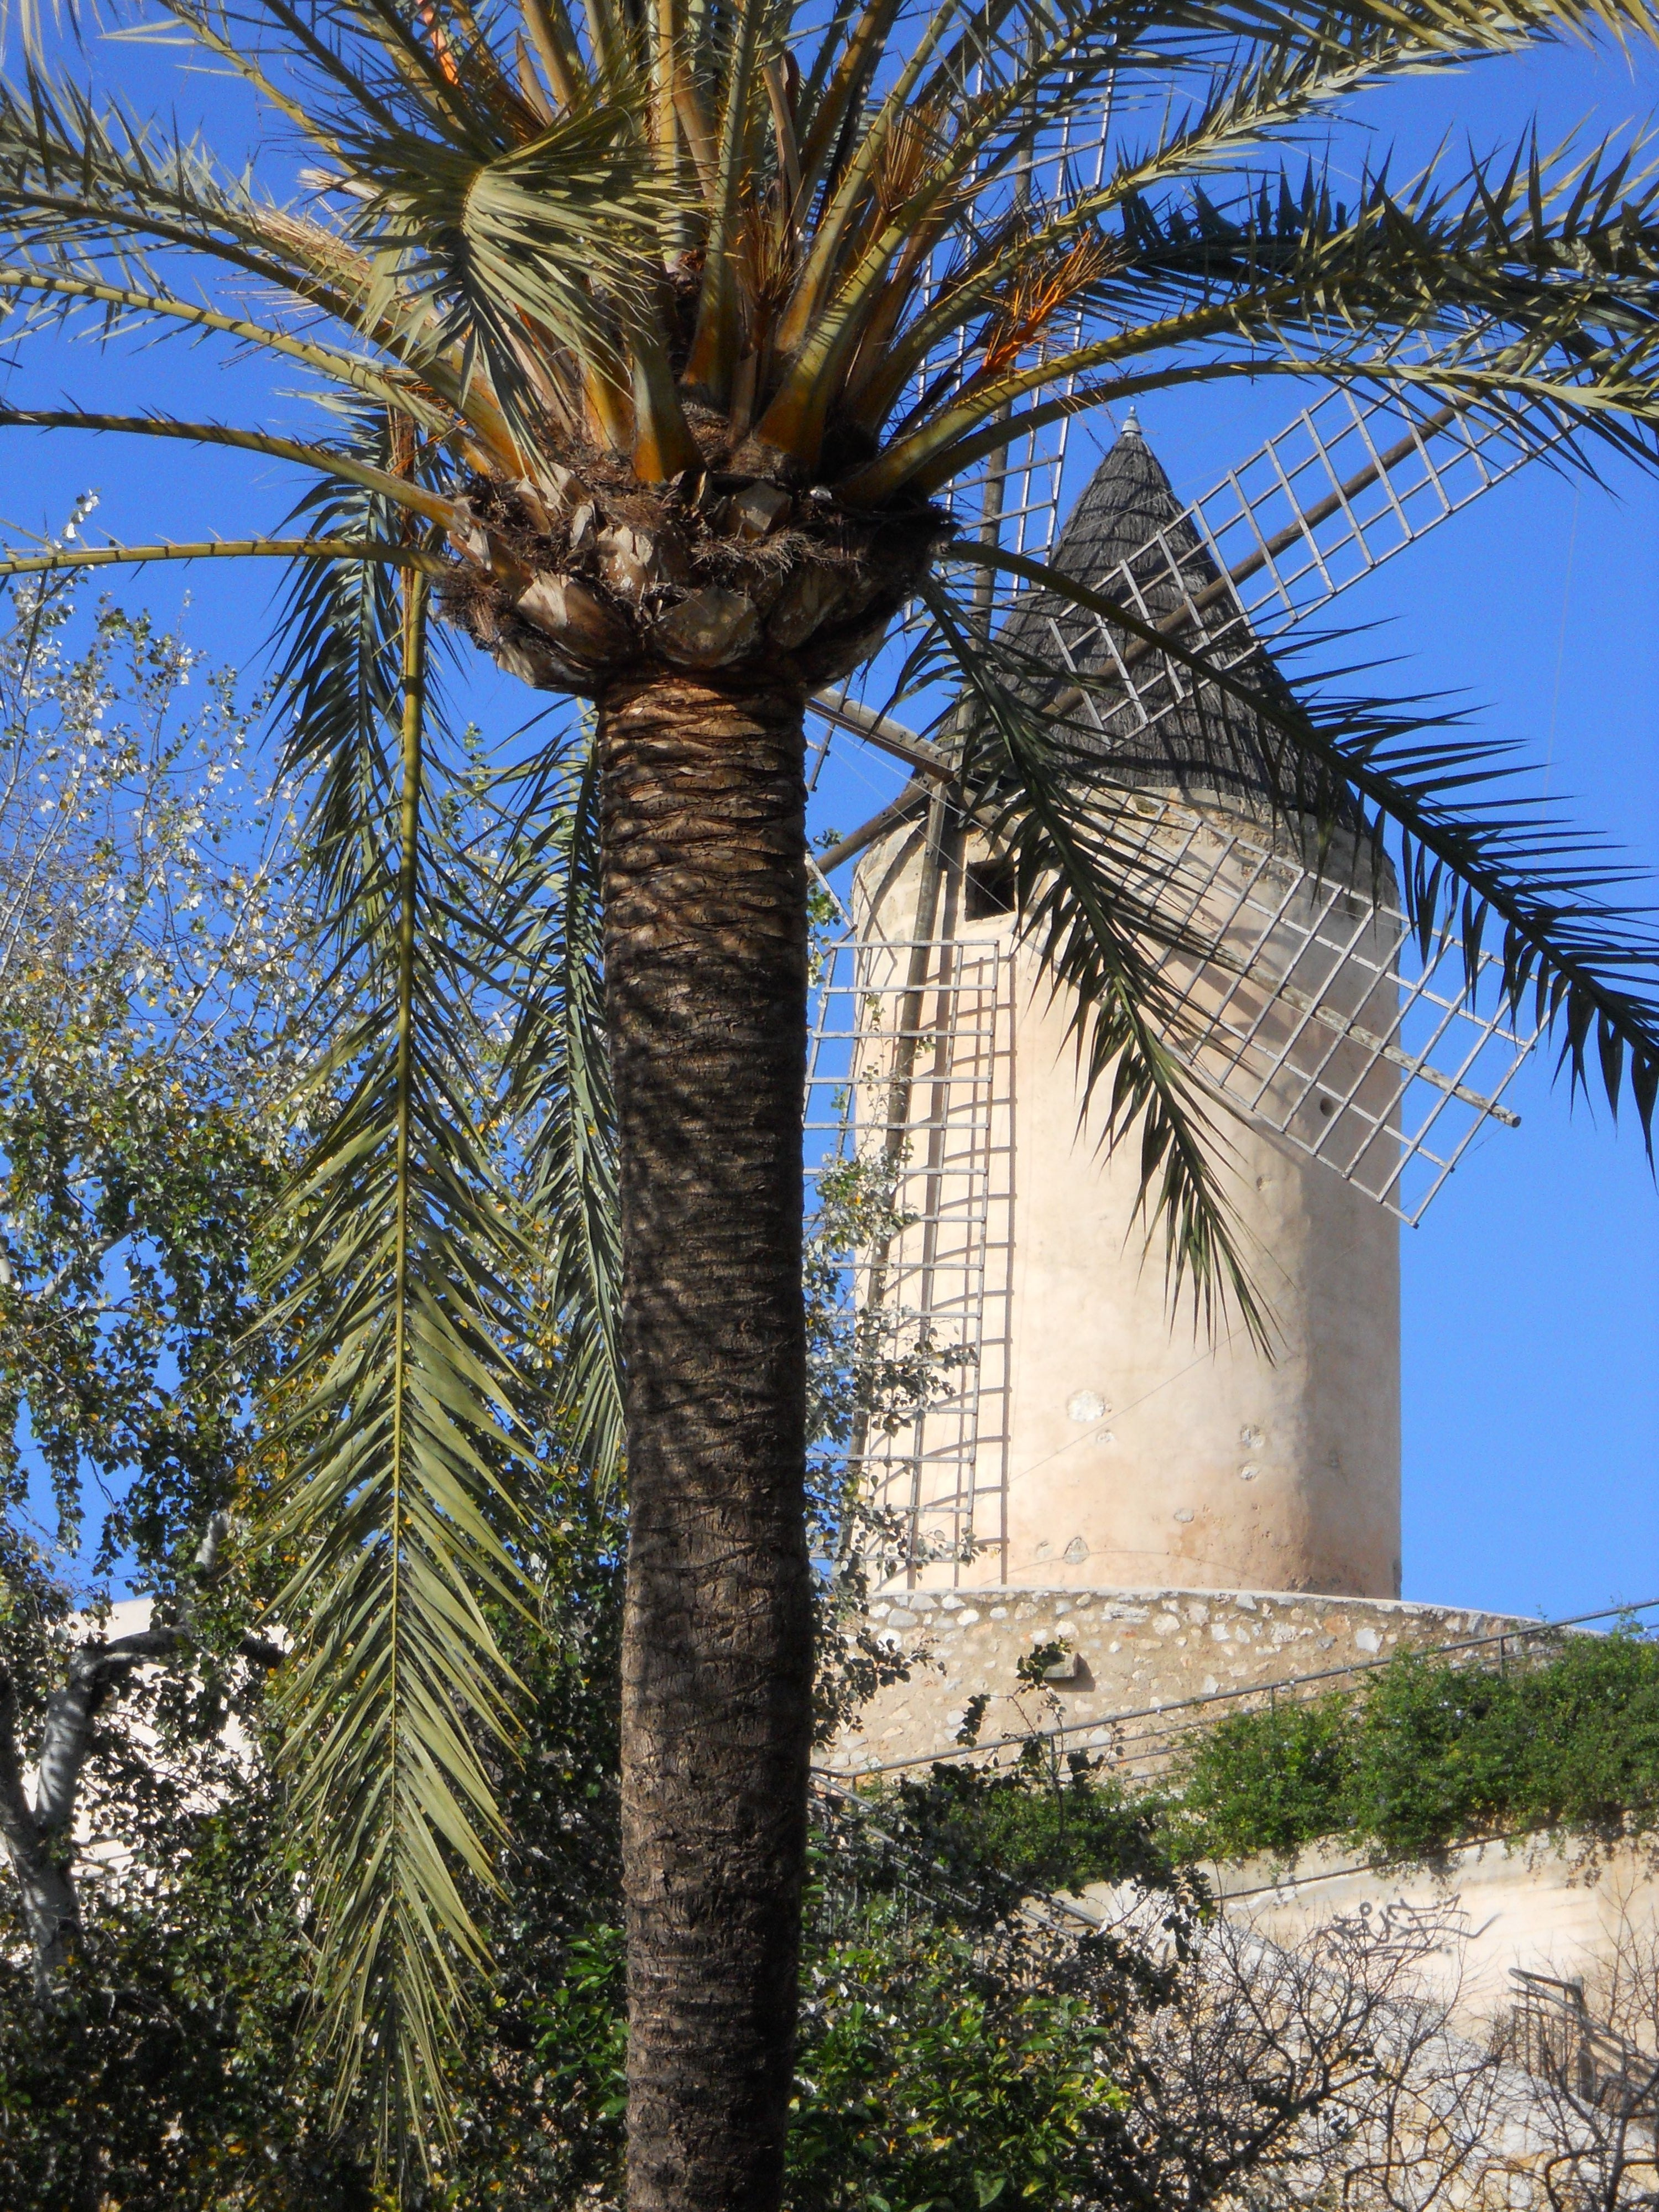 Windmühle in Palma